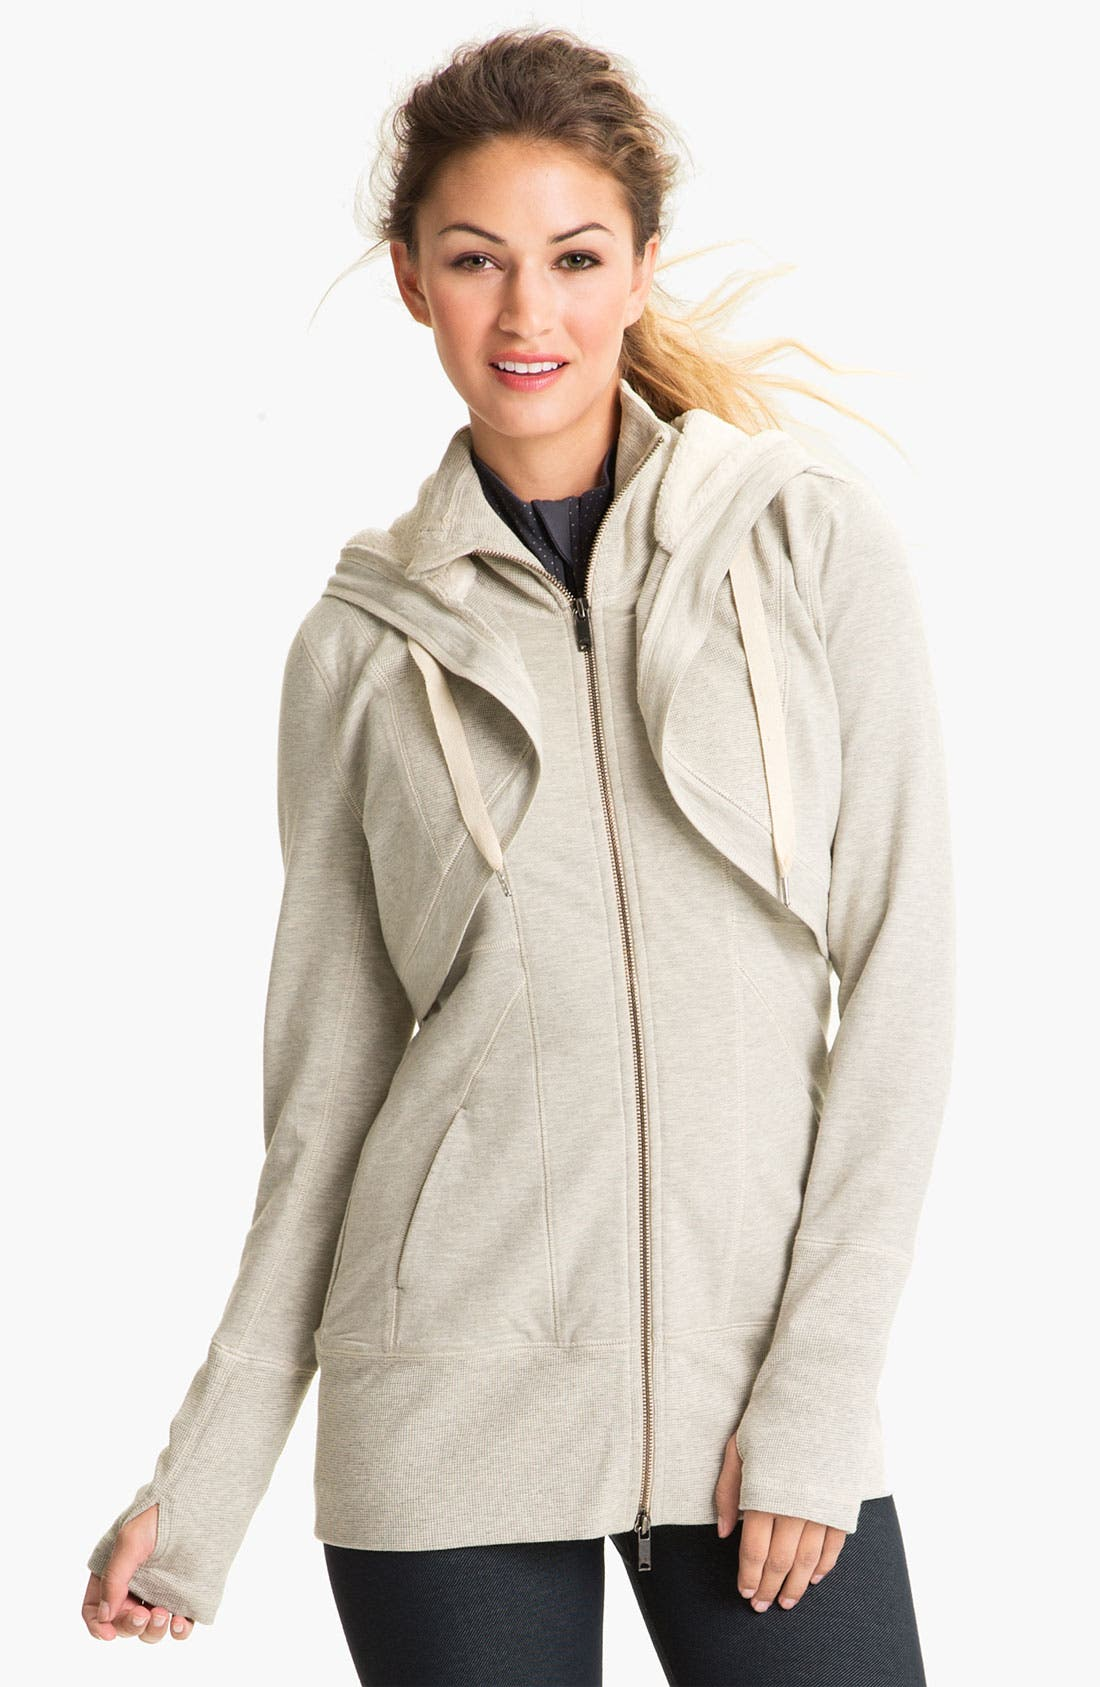 Main Image - Zella 'Chalet' 3-in-1 Jacket